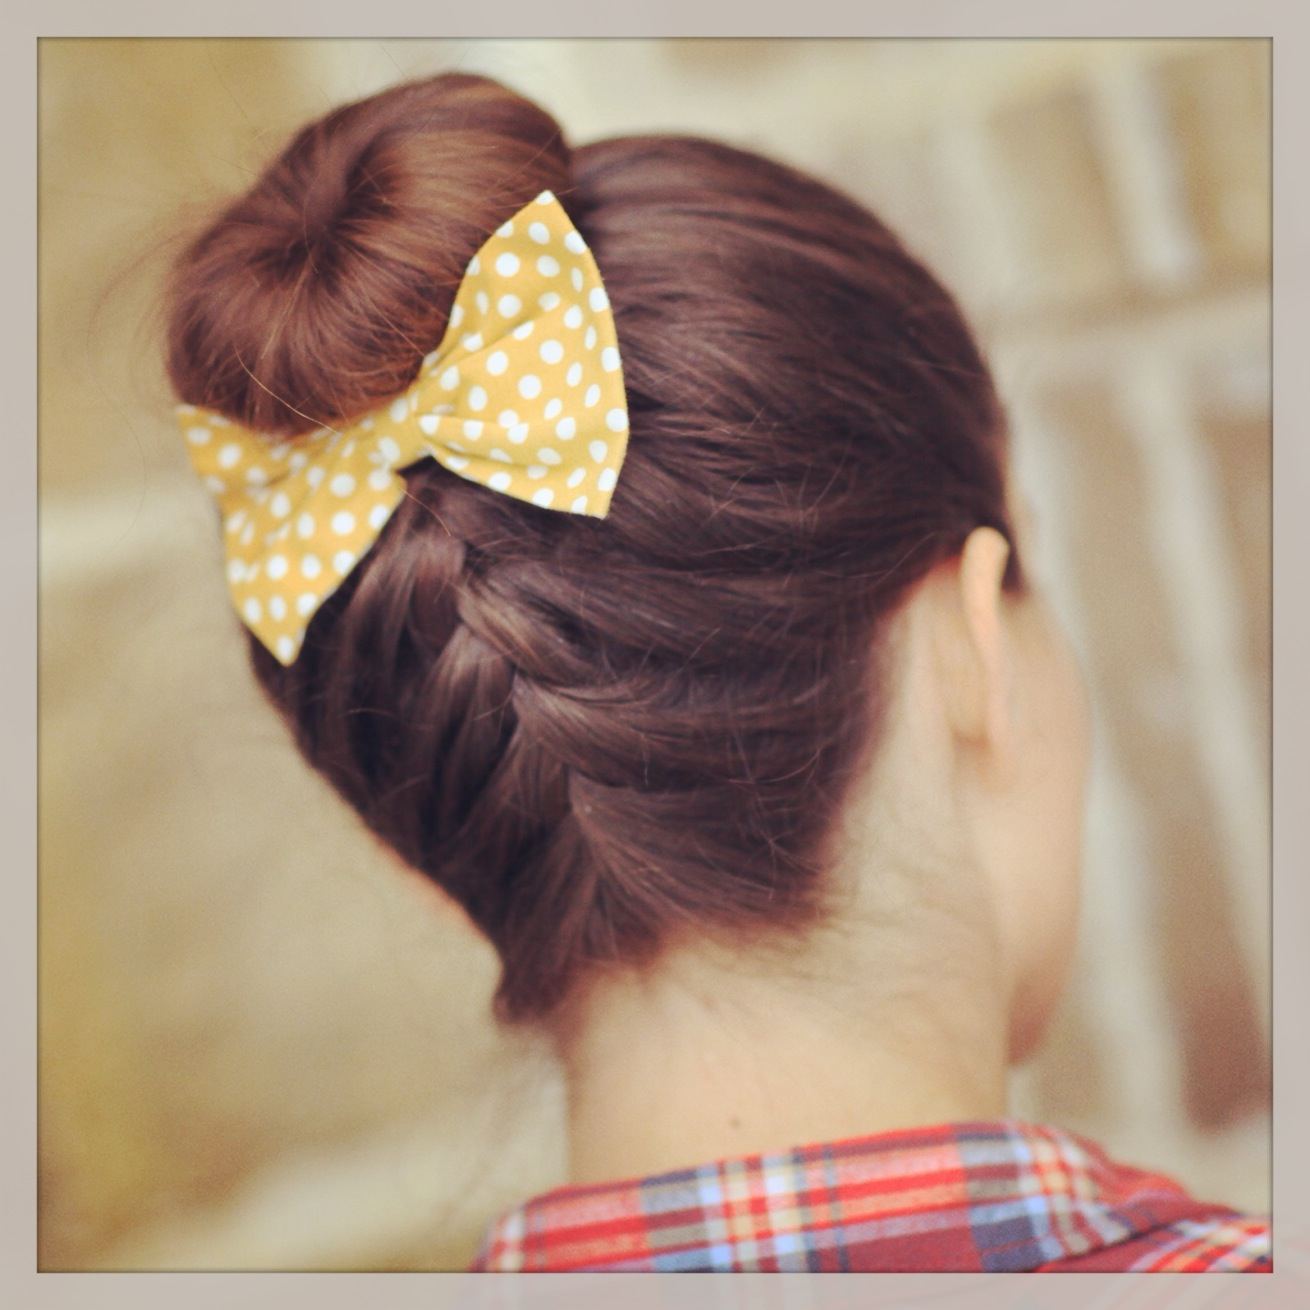 Sensational French Up High Bun Updo Hairstyle Ideas Cute Girls Hairstyles Schematic Wiring Diagrams Phreekkolirunnerswayorg